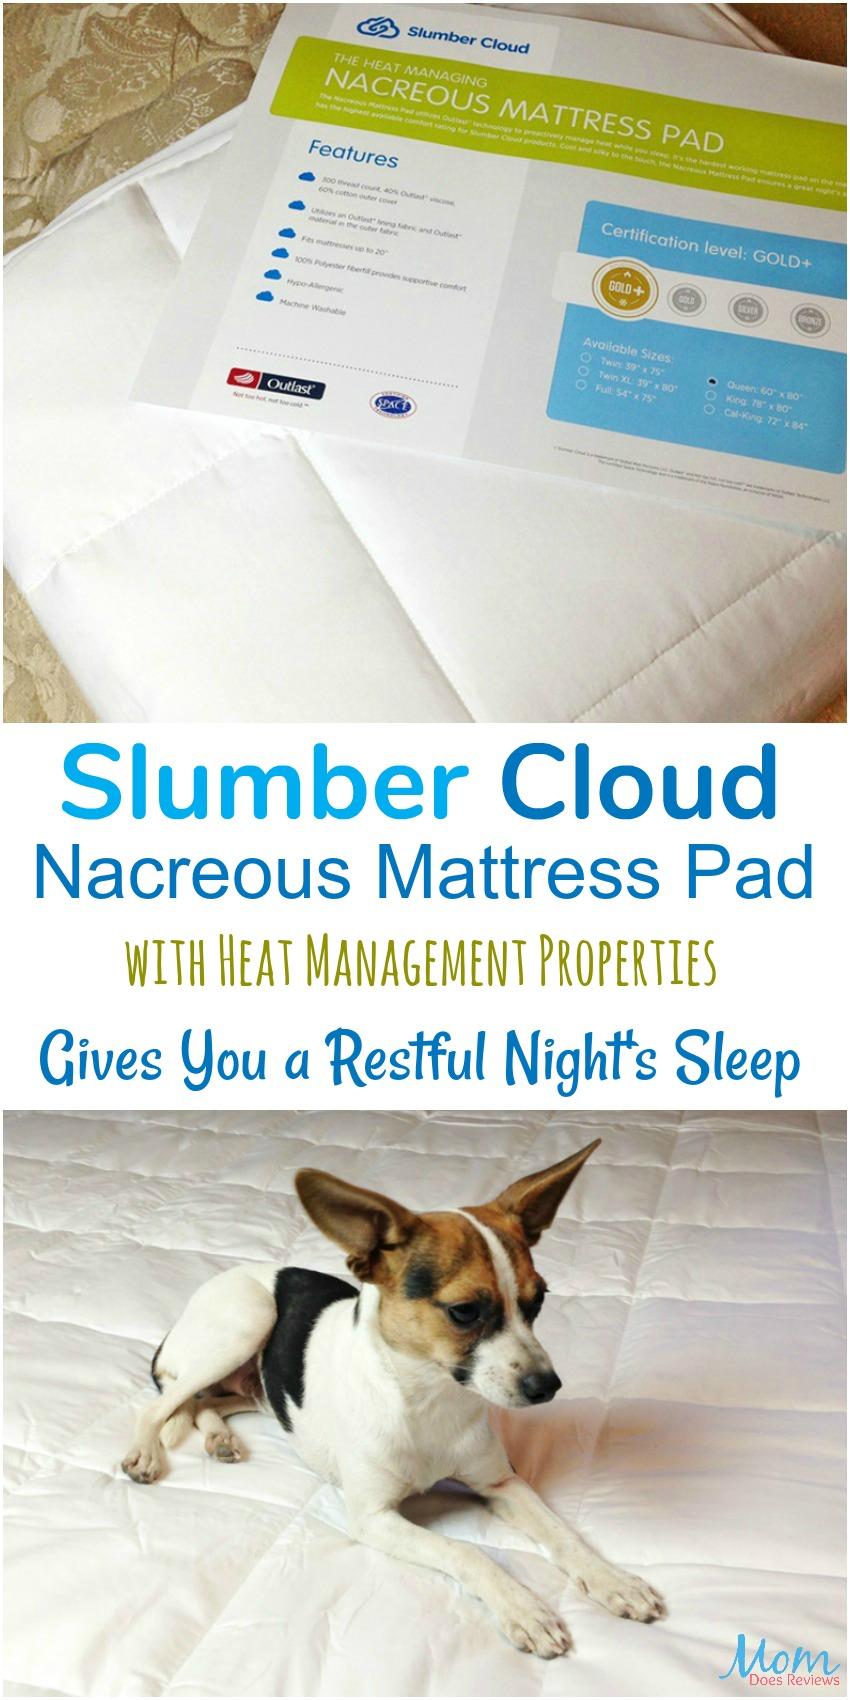 Slumber Cloud Nacreous Mattress Pad With Heat Management